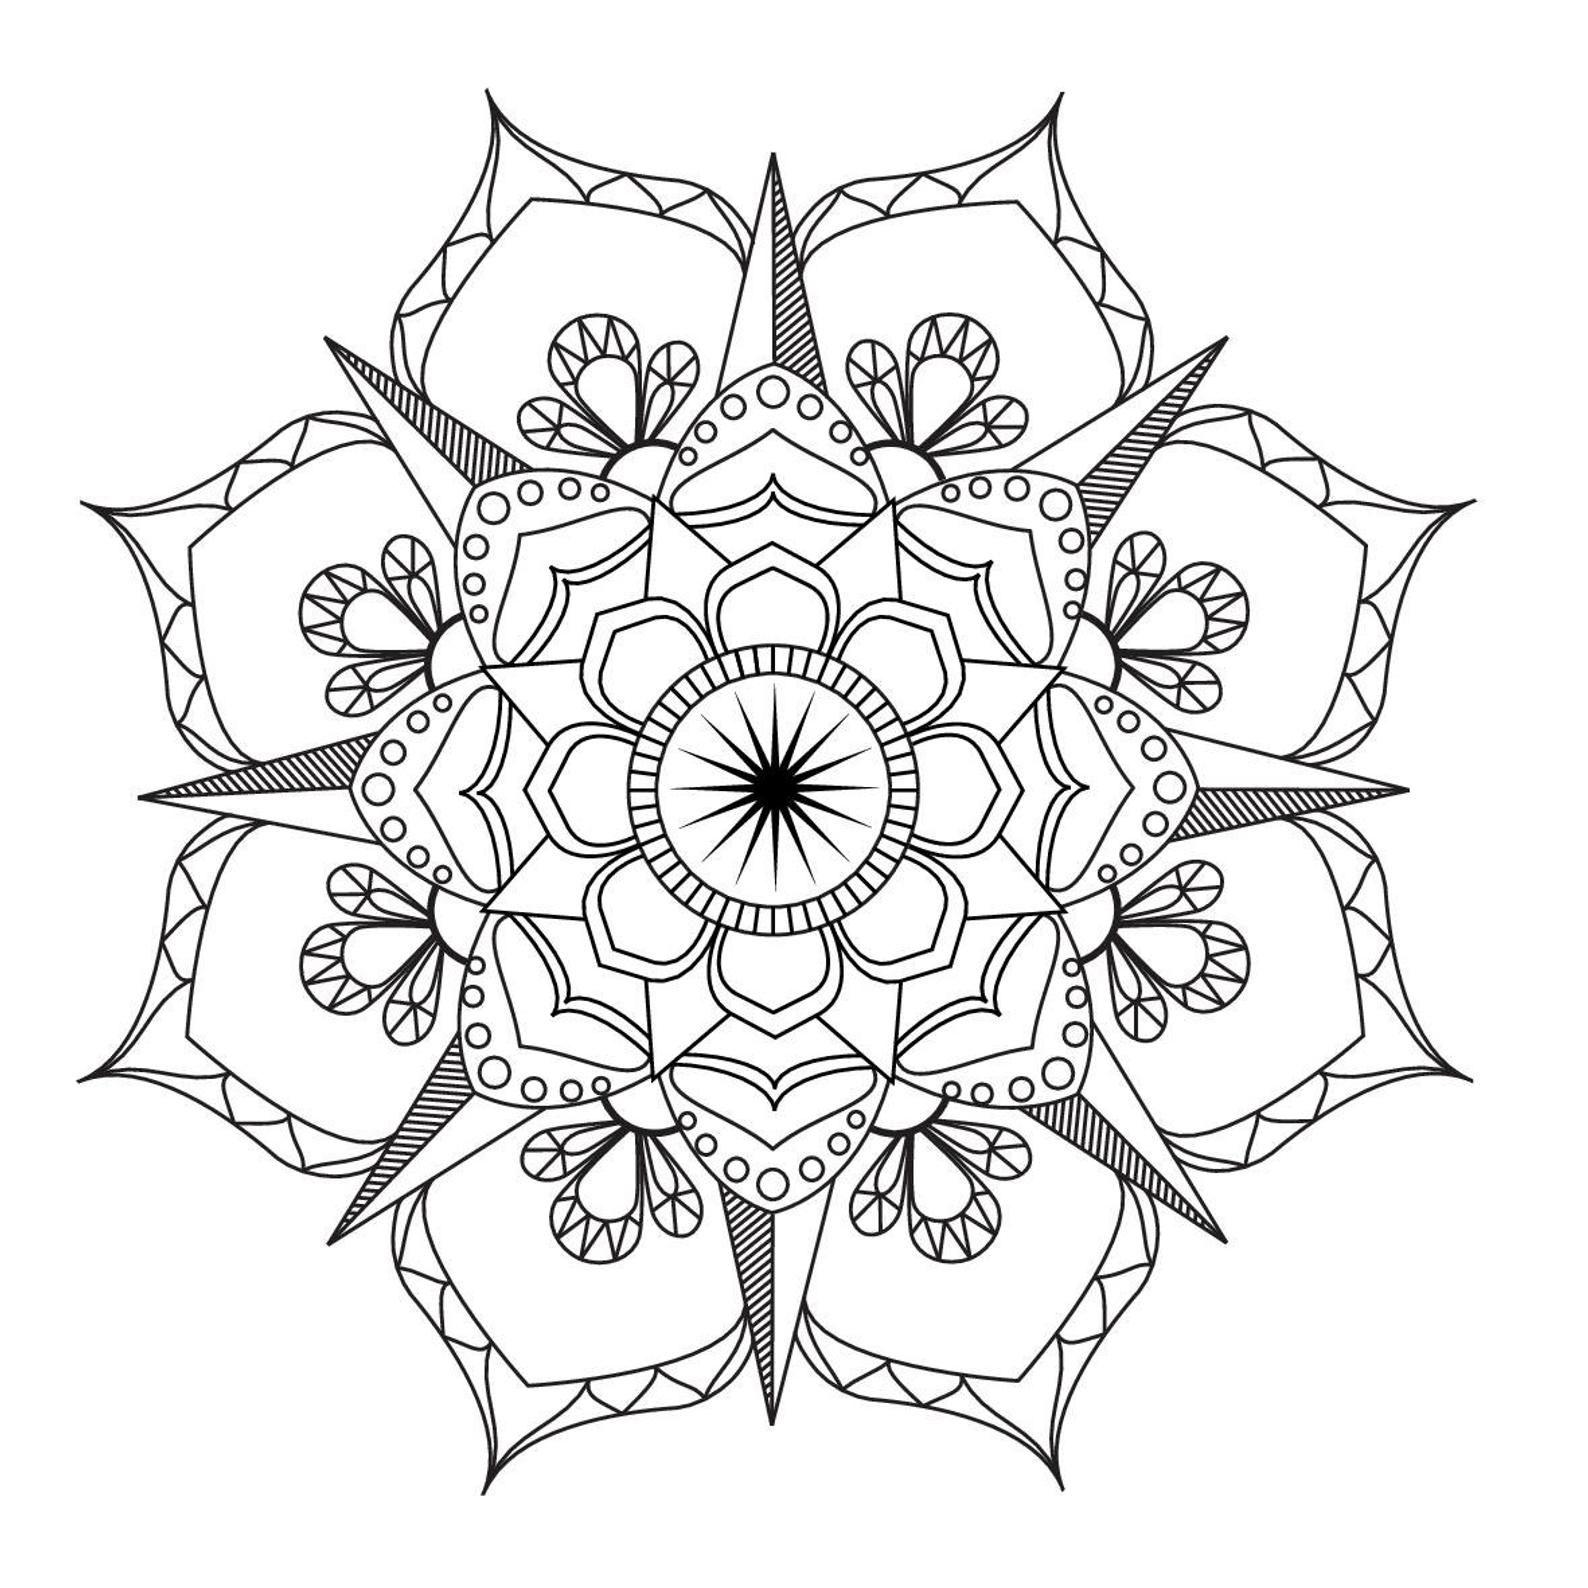 Flower Mandala Coloring Pages Online Portraits